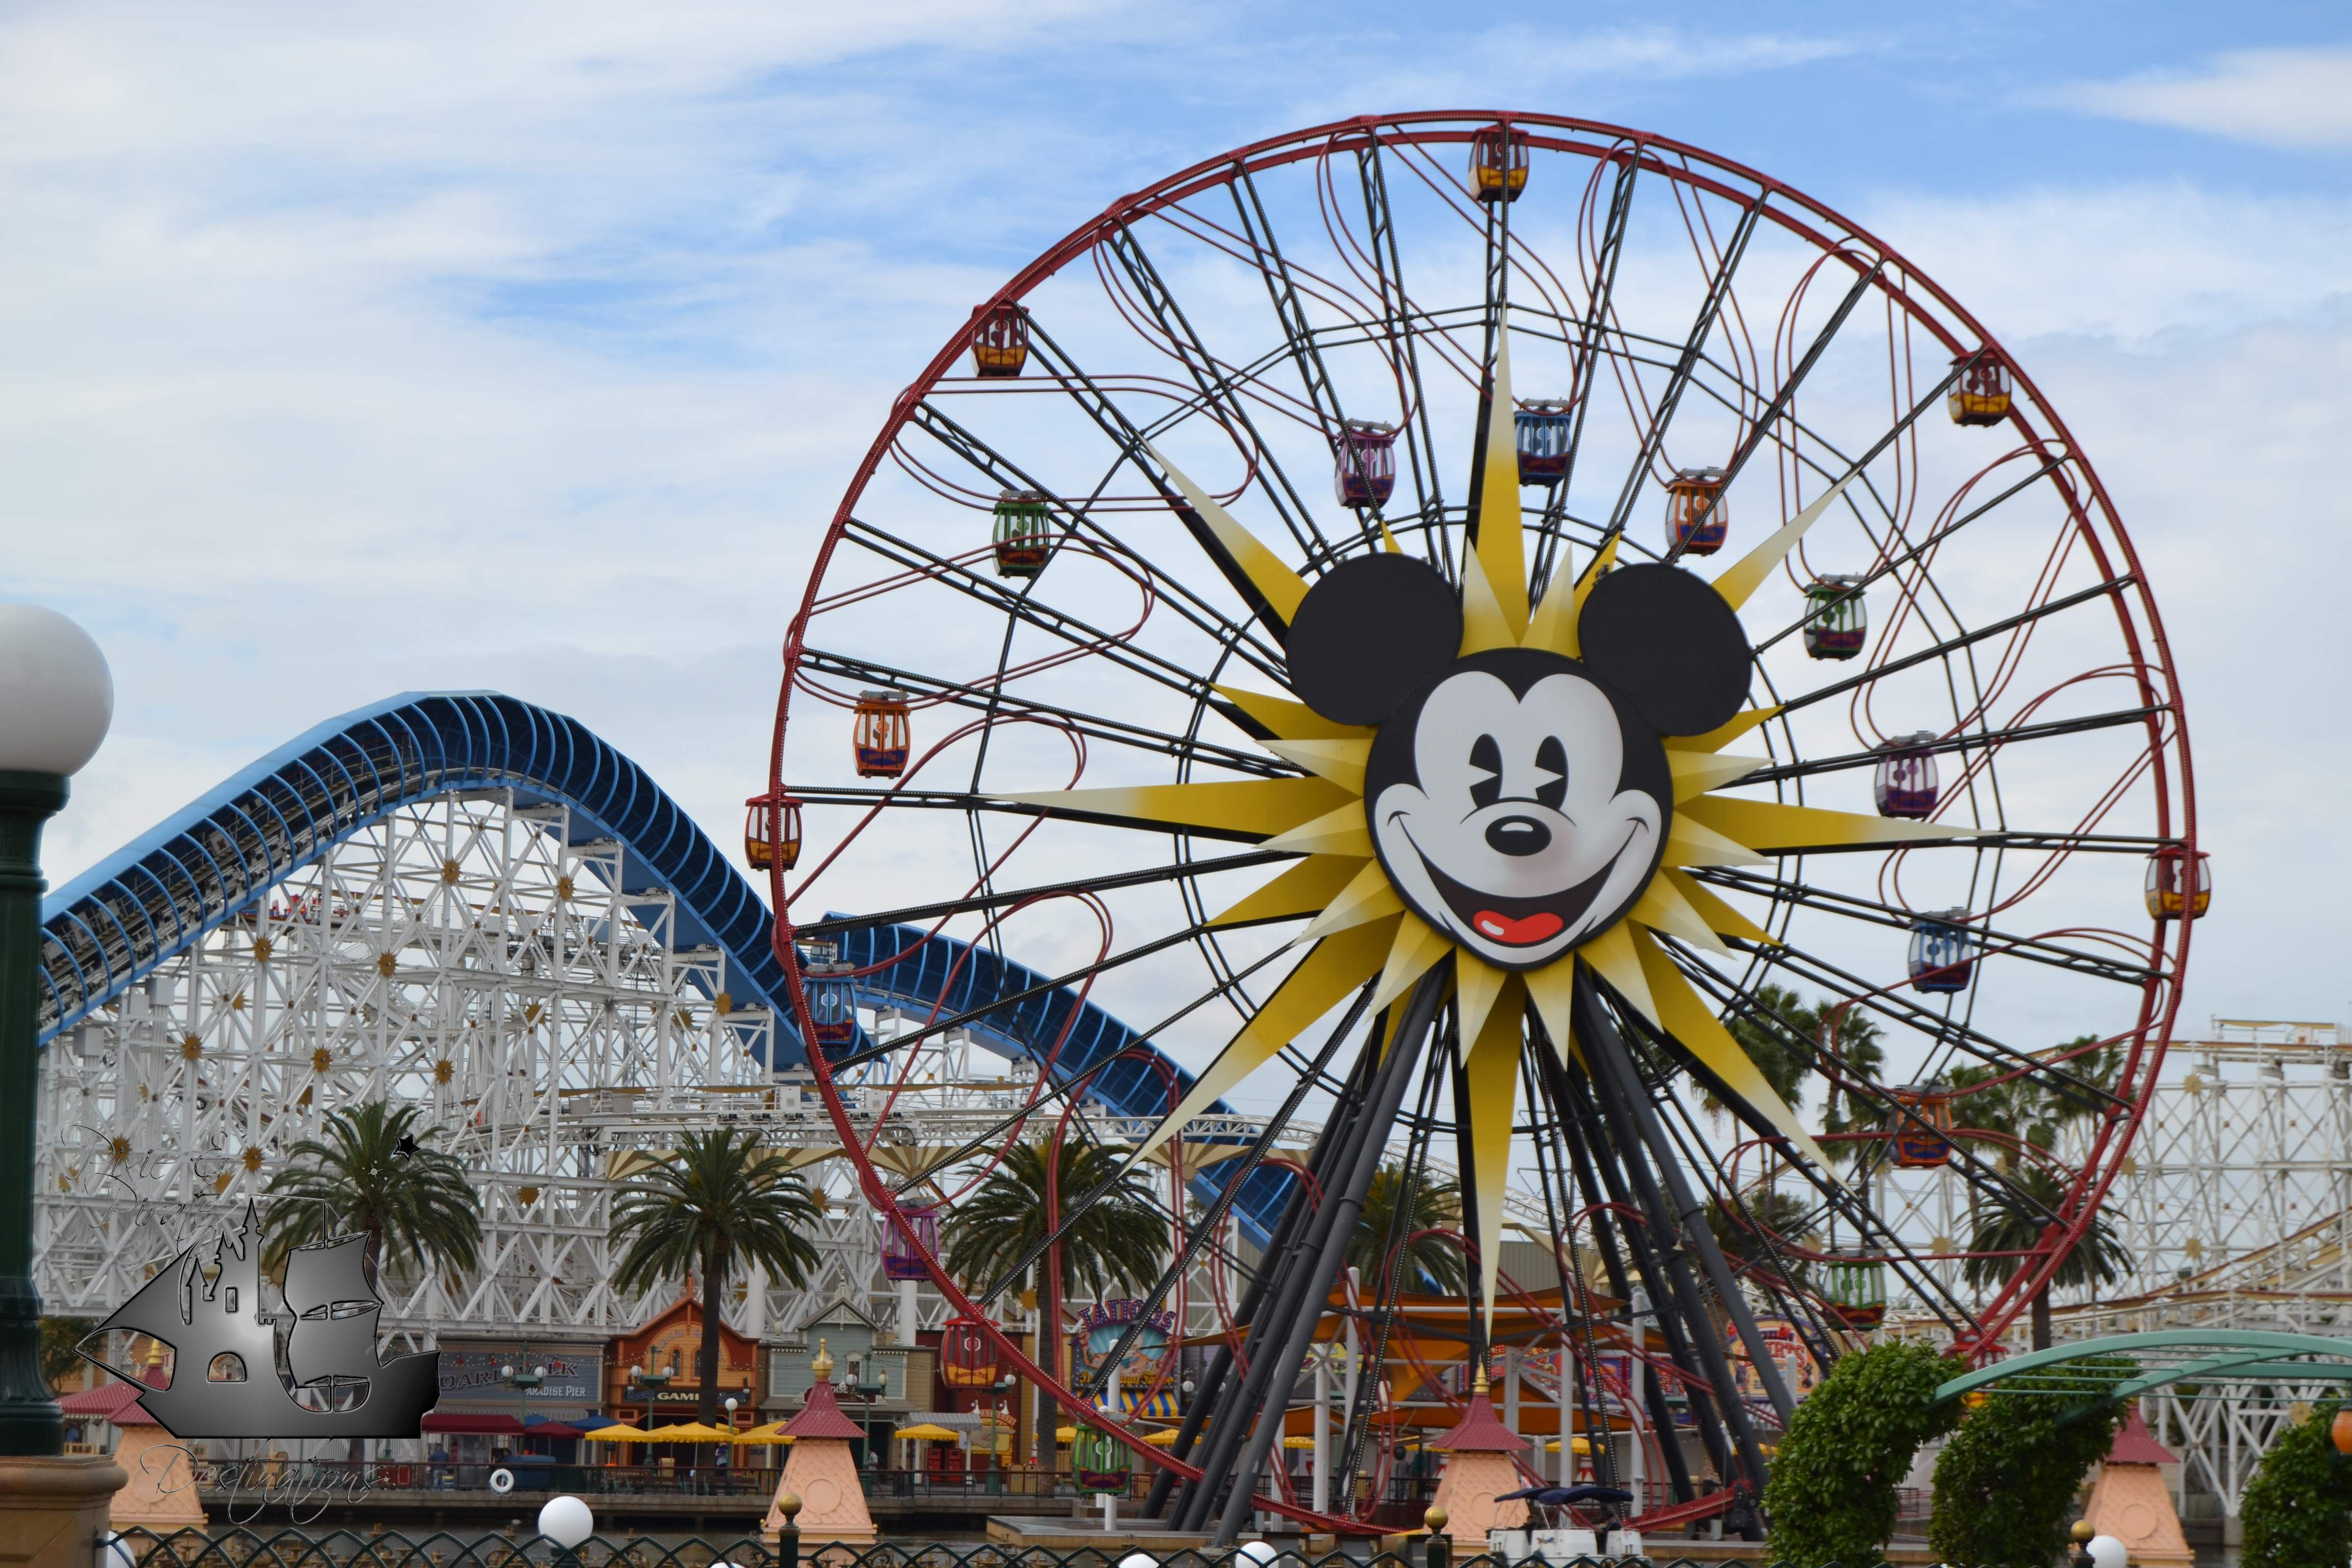 Disneyland In California Is Celebrating A Diamond